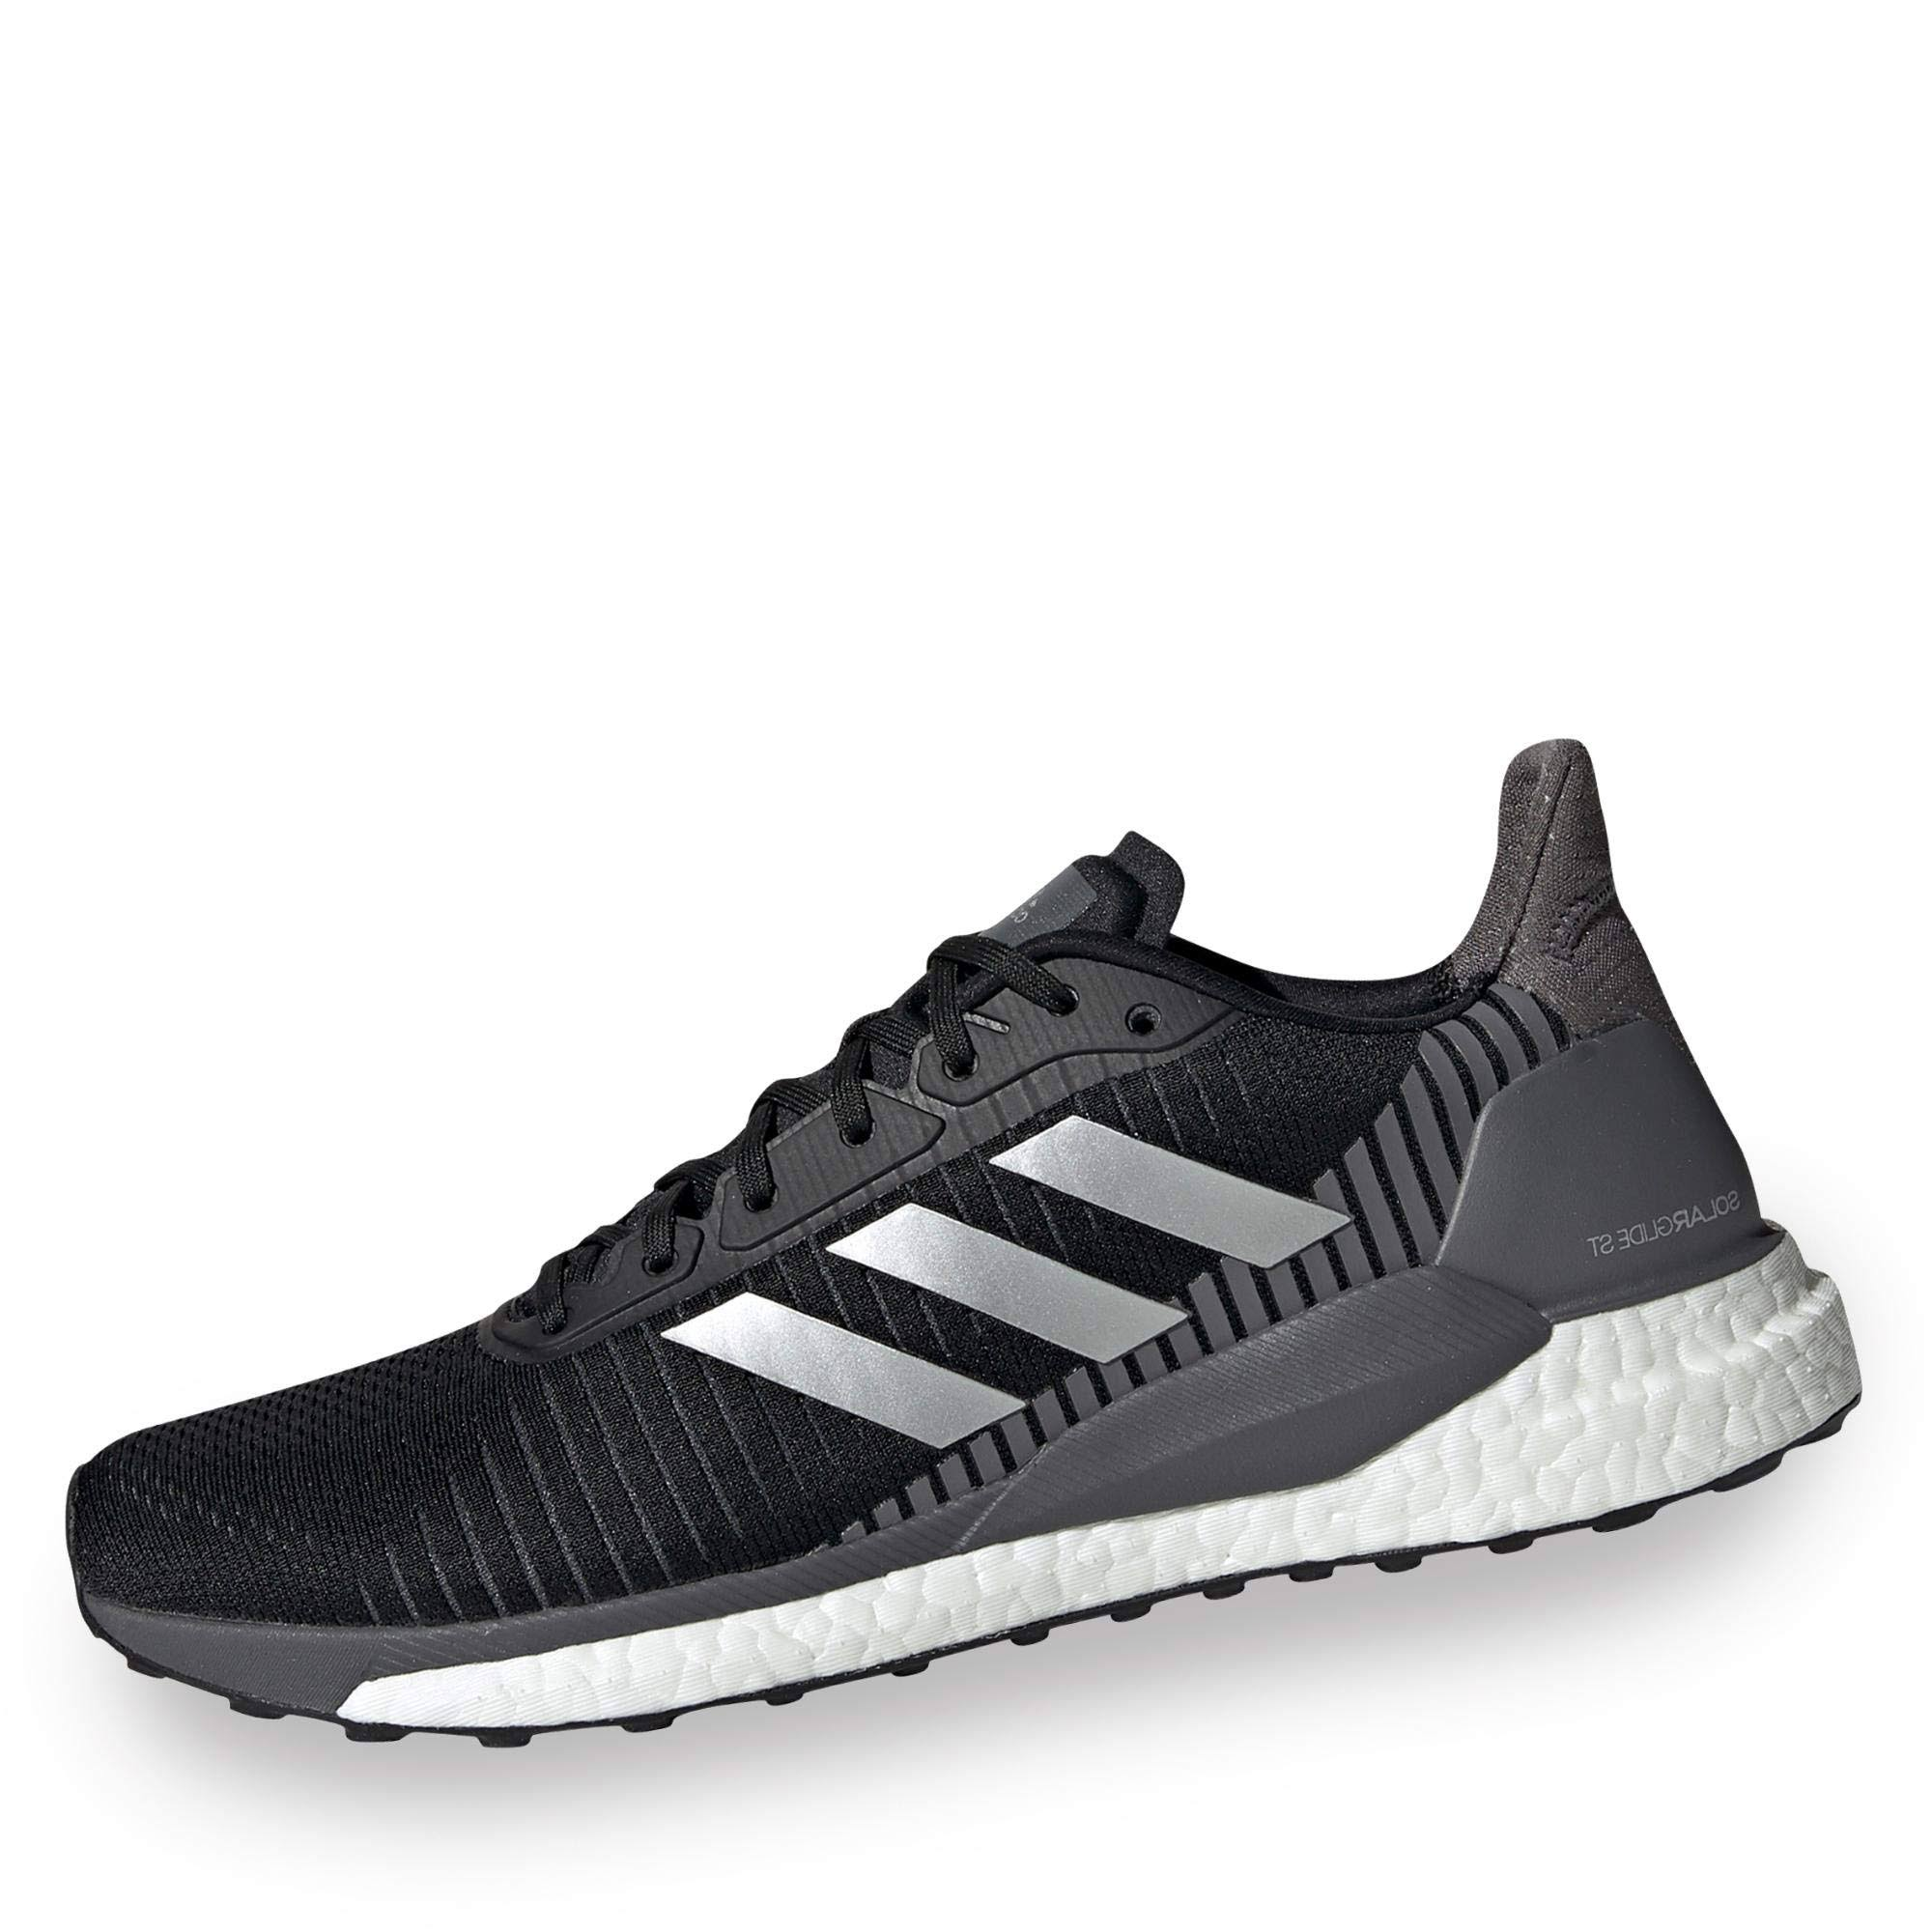 Adidas Solar Glide ST 19 Shoes Running - Black - Men